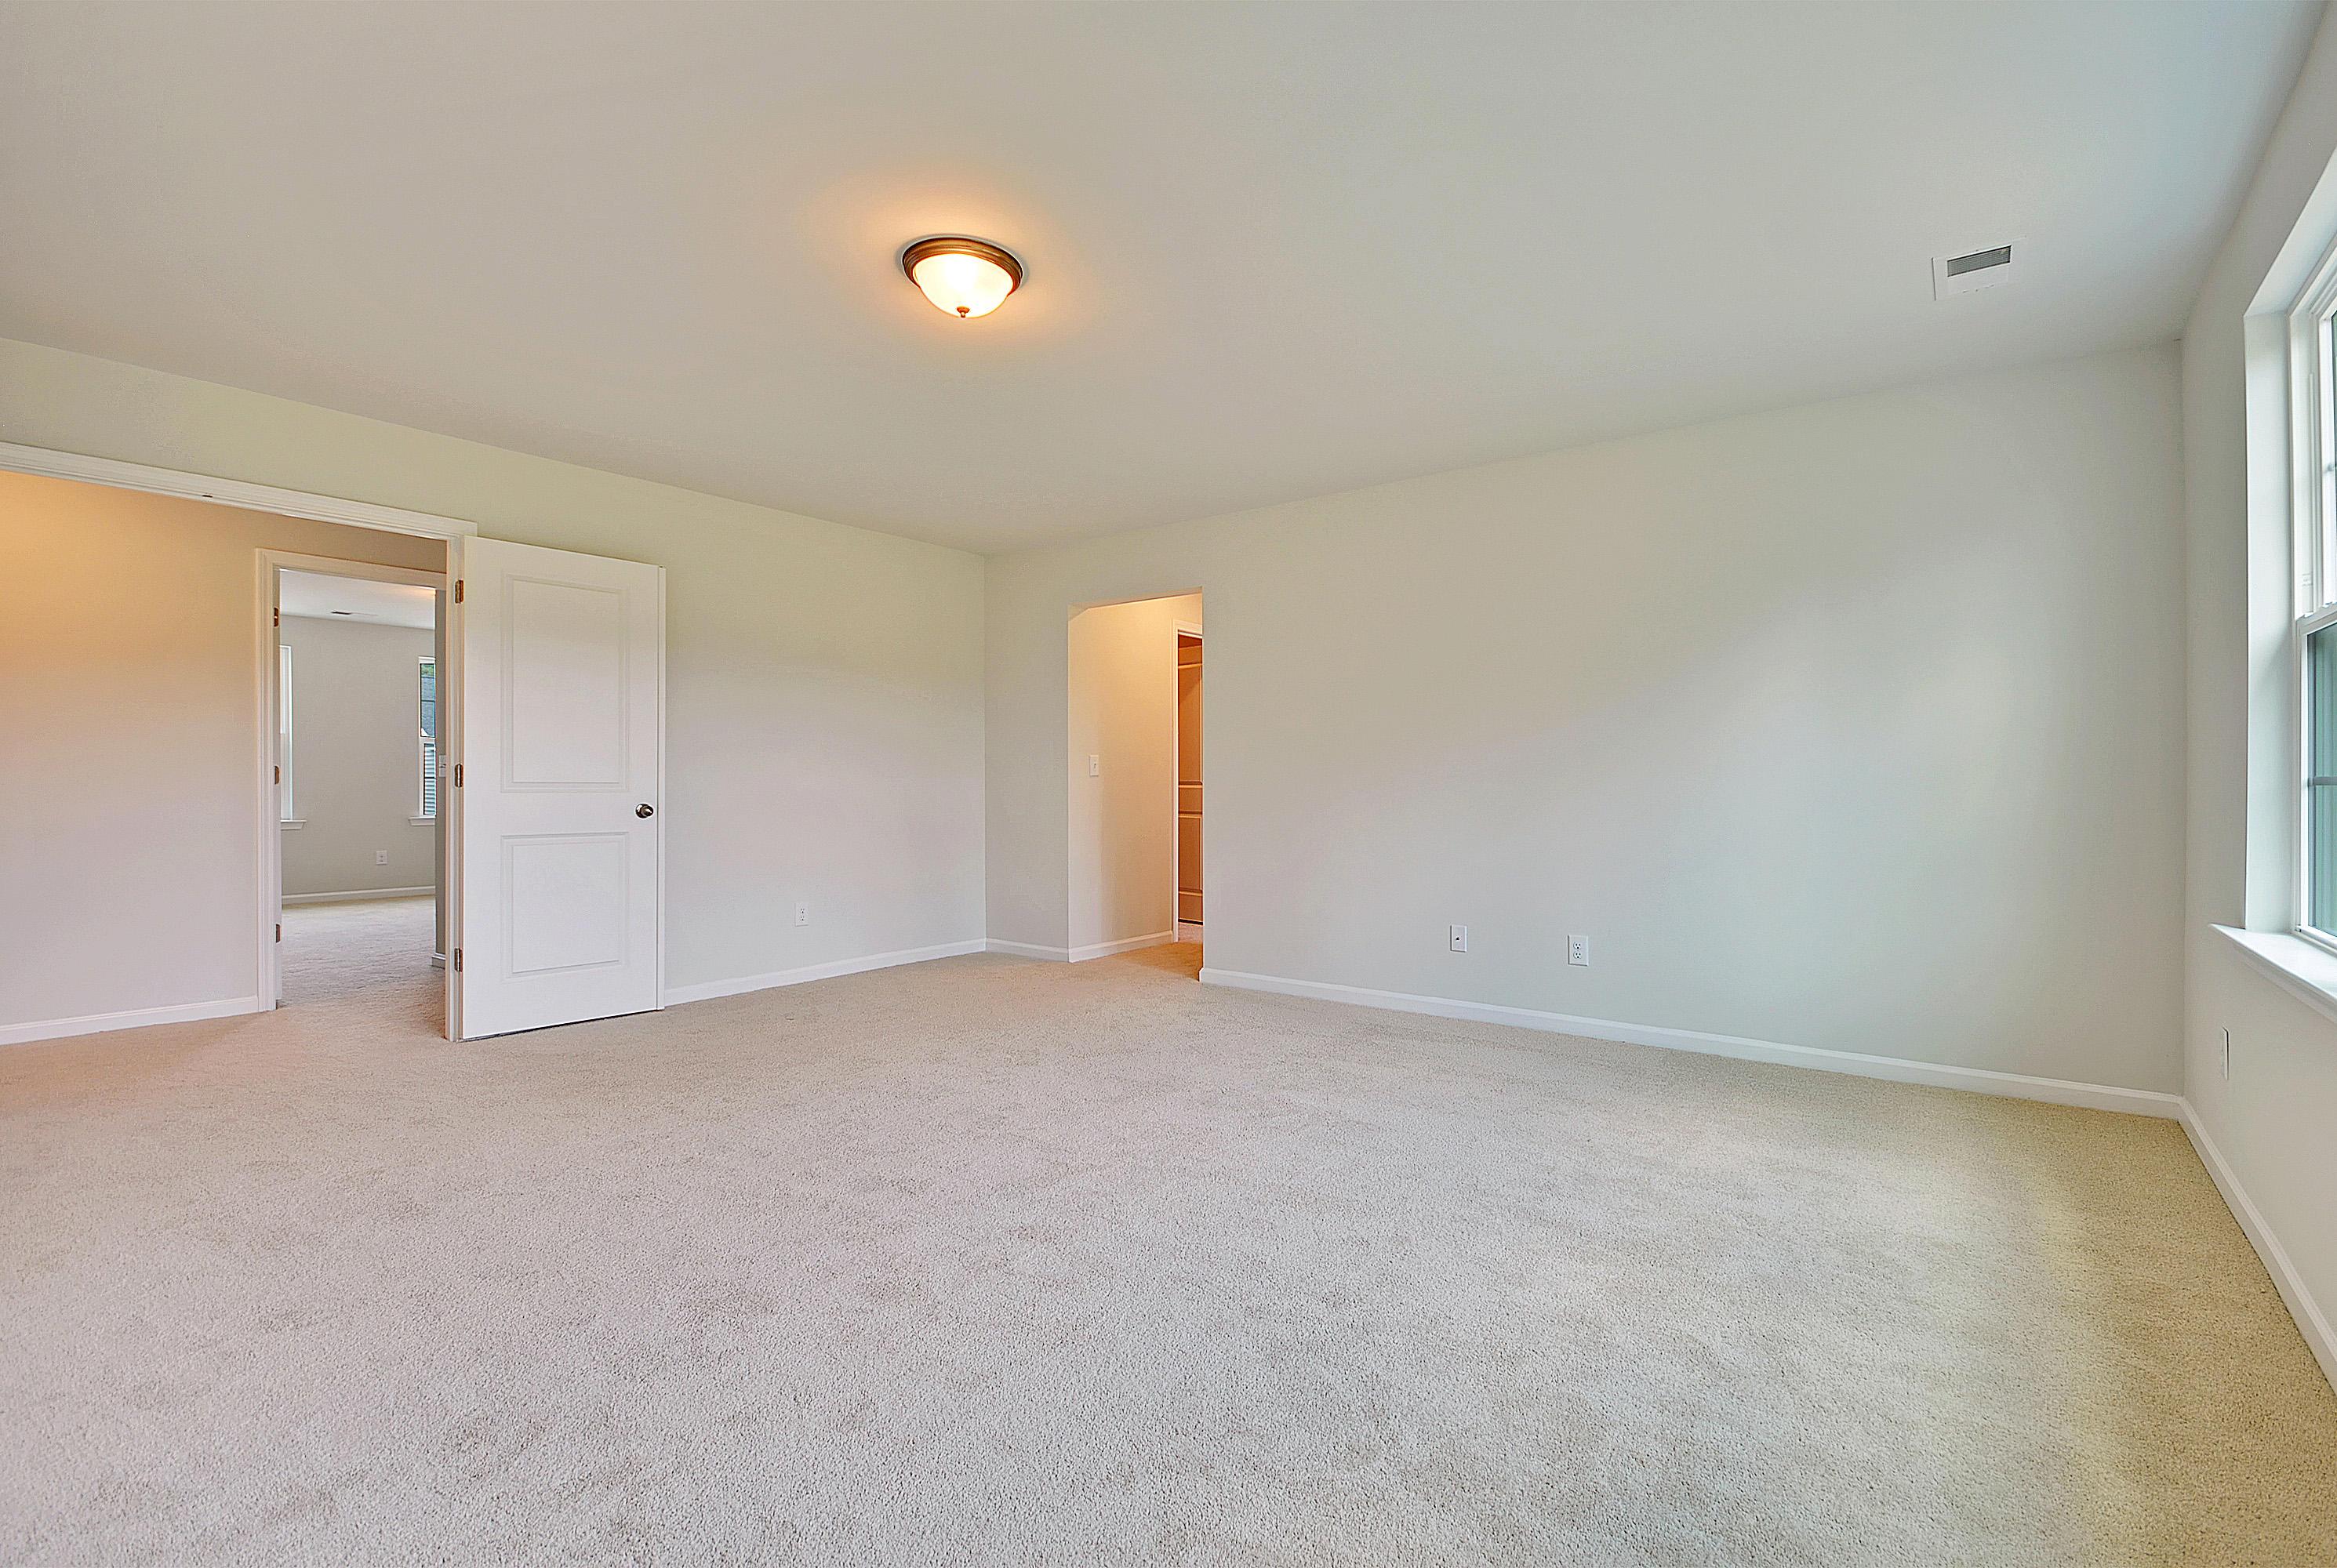 Coosaw Preserve Homes For Sale - 5162 Preserve Blvd, Ladson, SC - 5